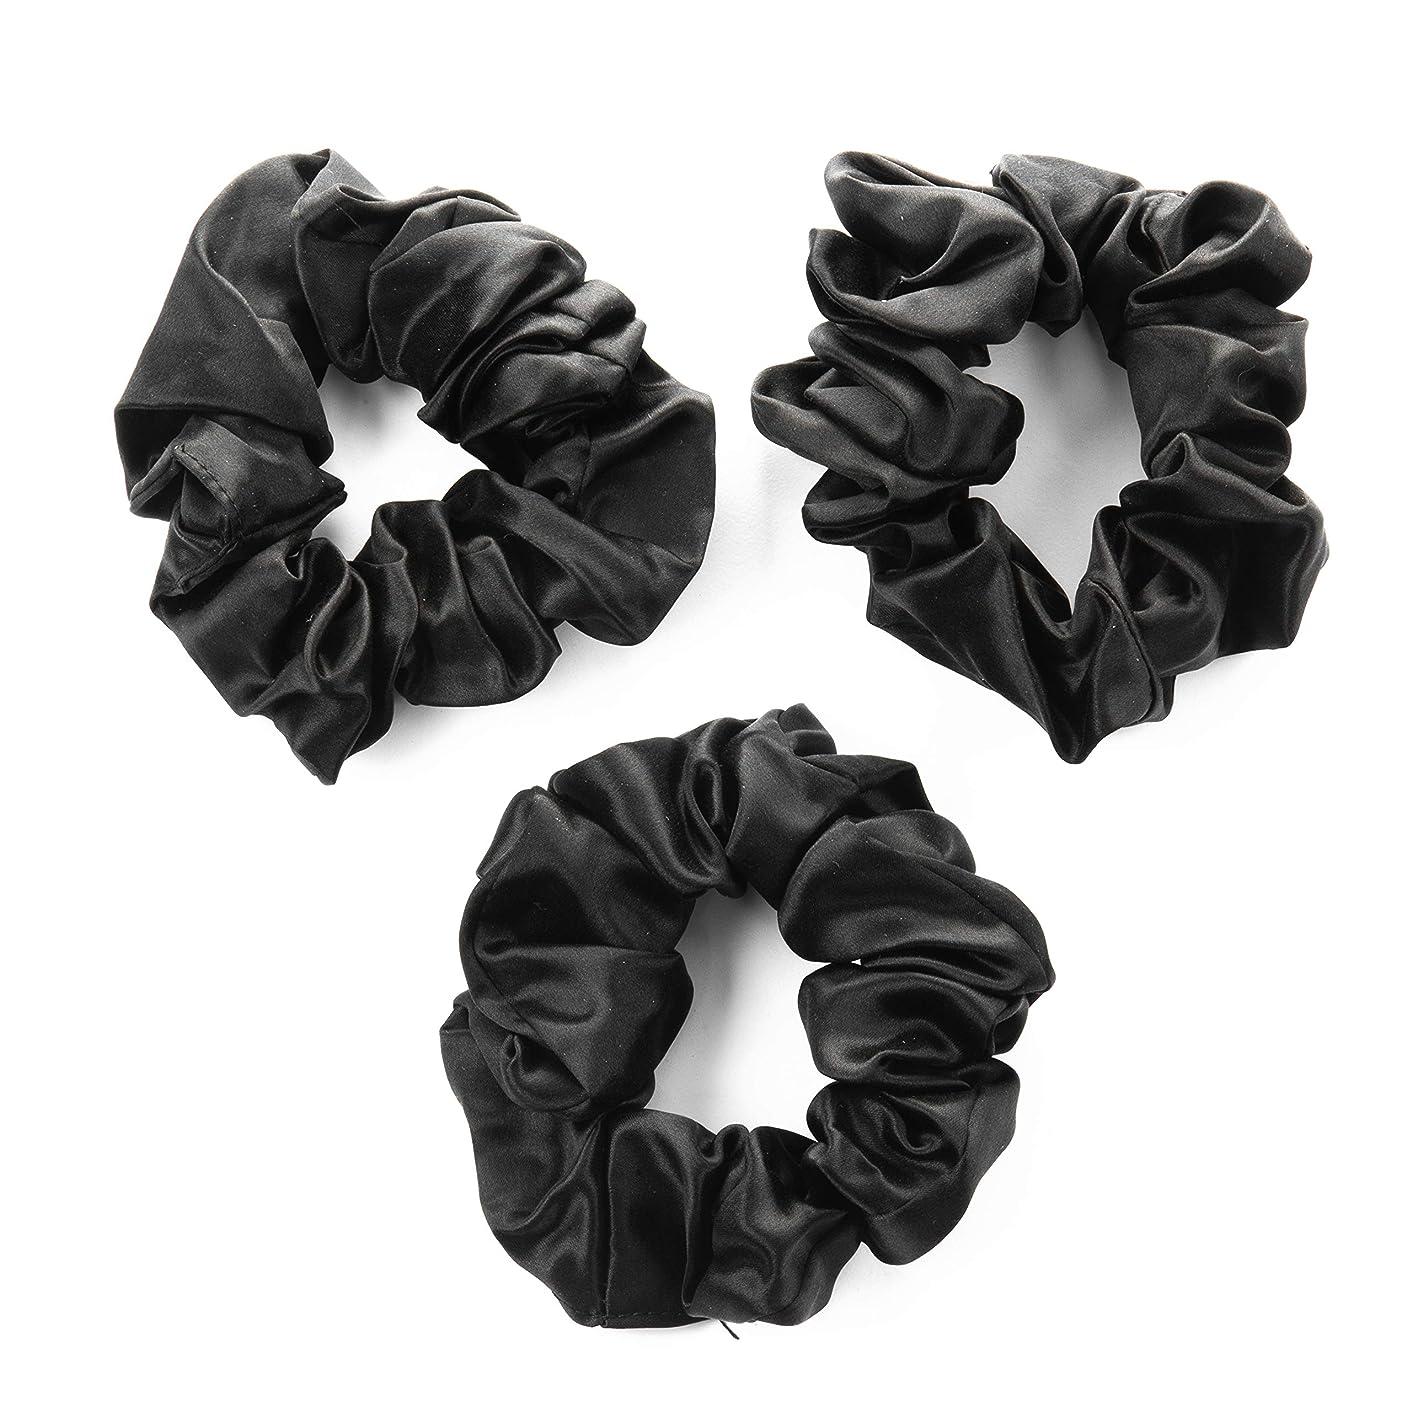 100% Premium Mulberry Silk Hair Luxe Scrunchies (Pack of 3 Black Hair Ties Per Box)